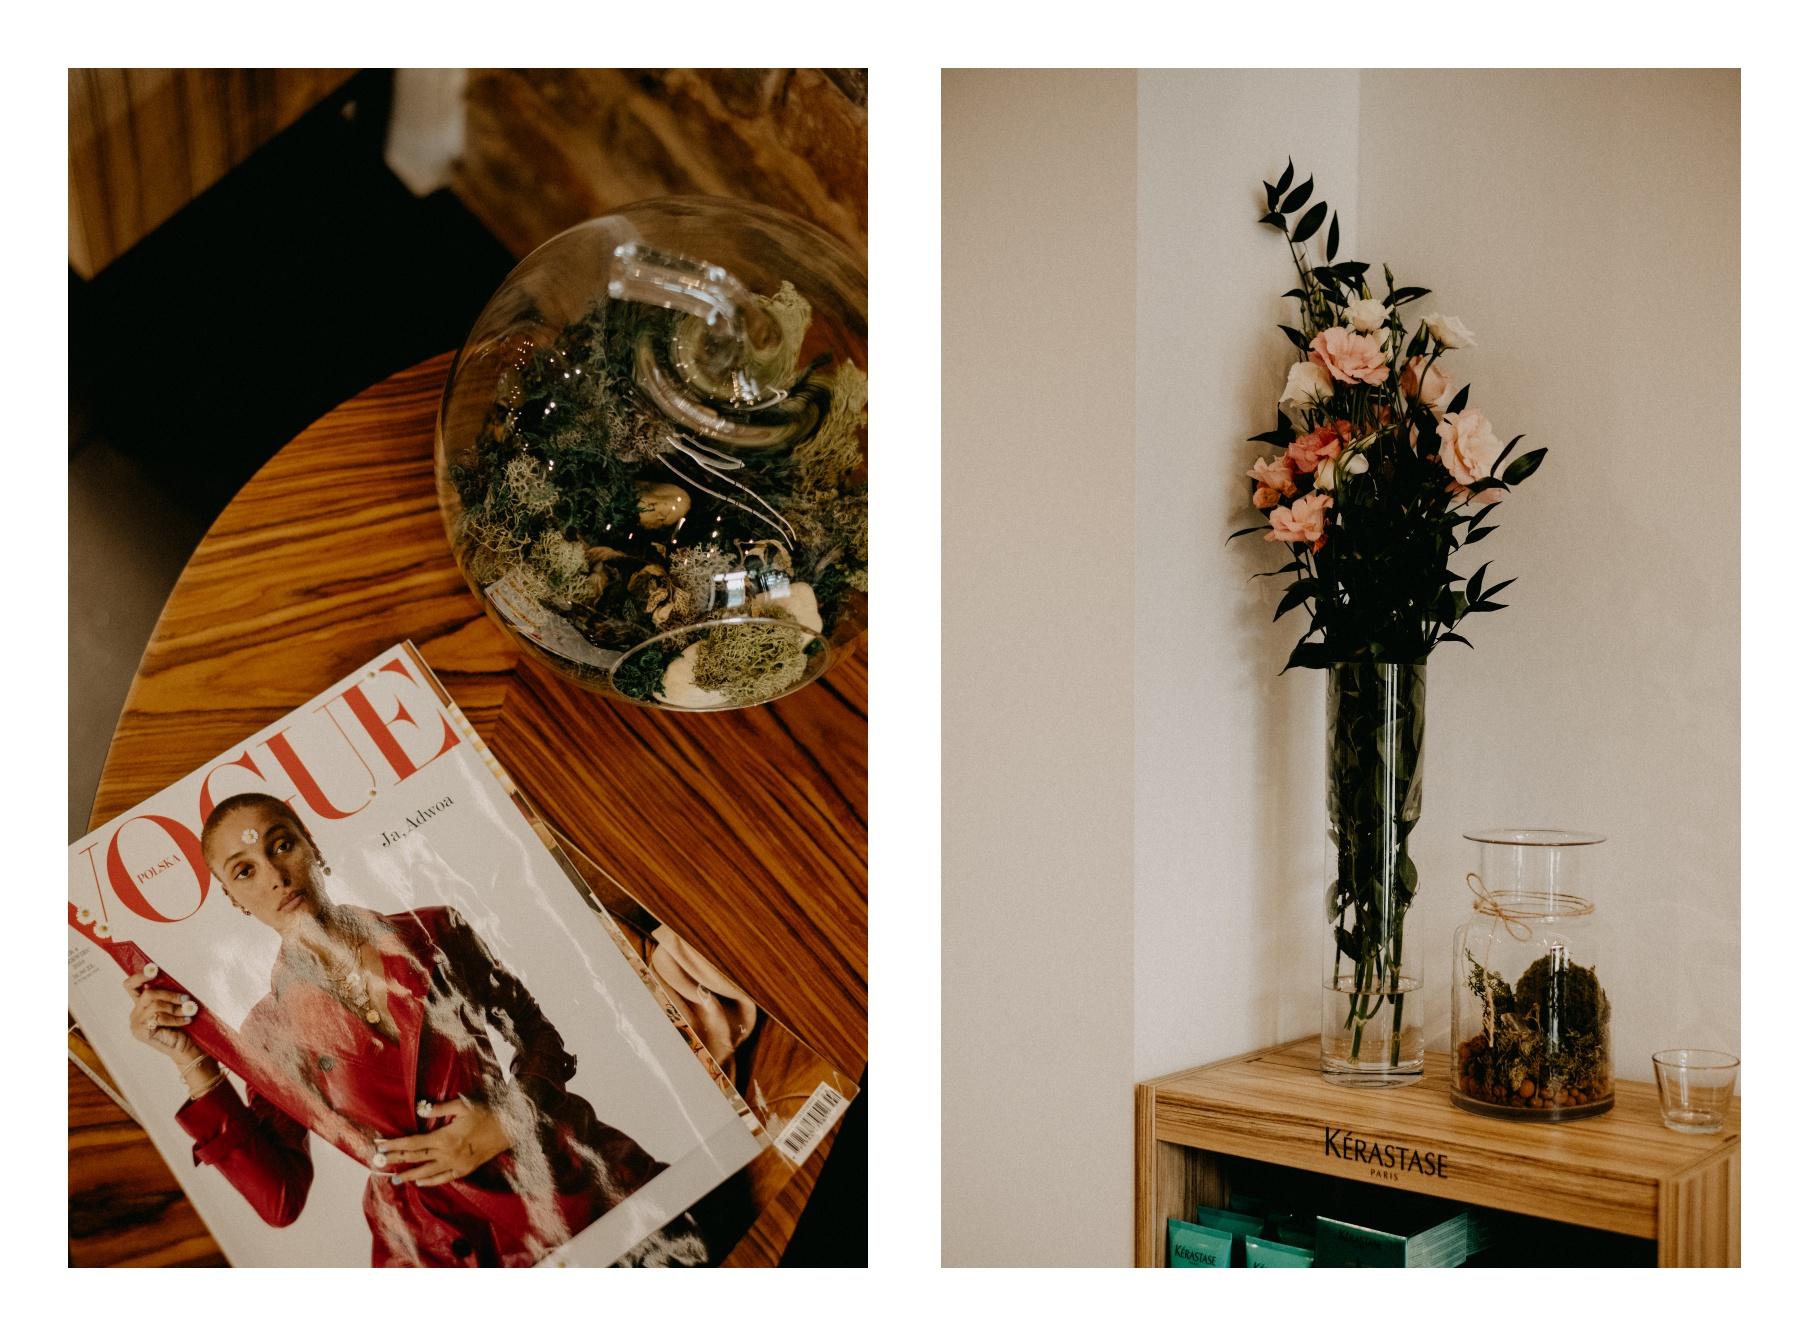 vogue poland, magazyn, kwiaty,